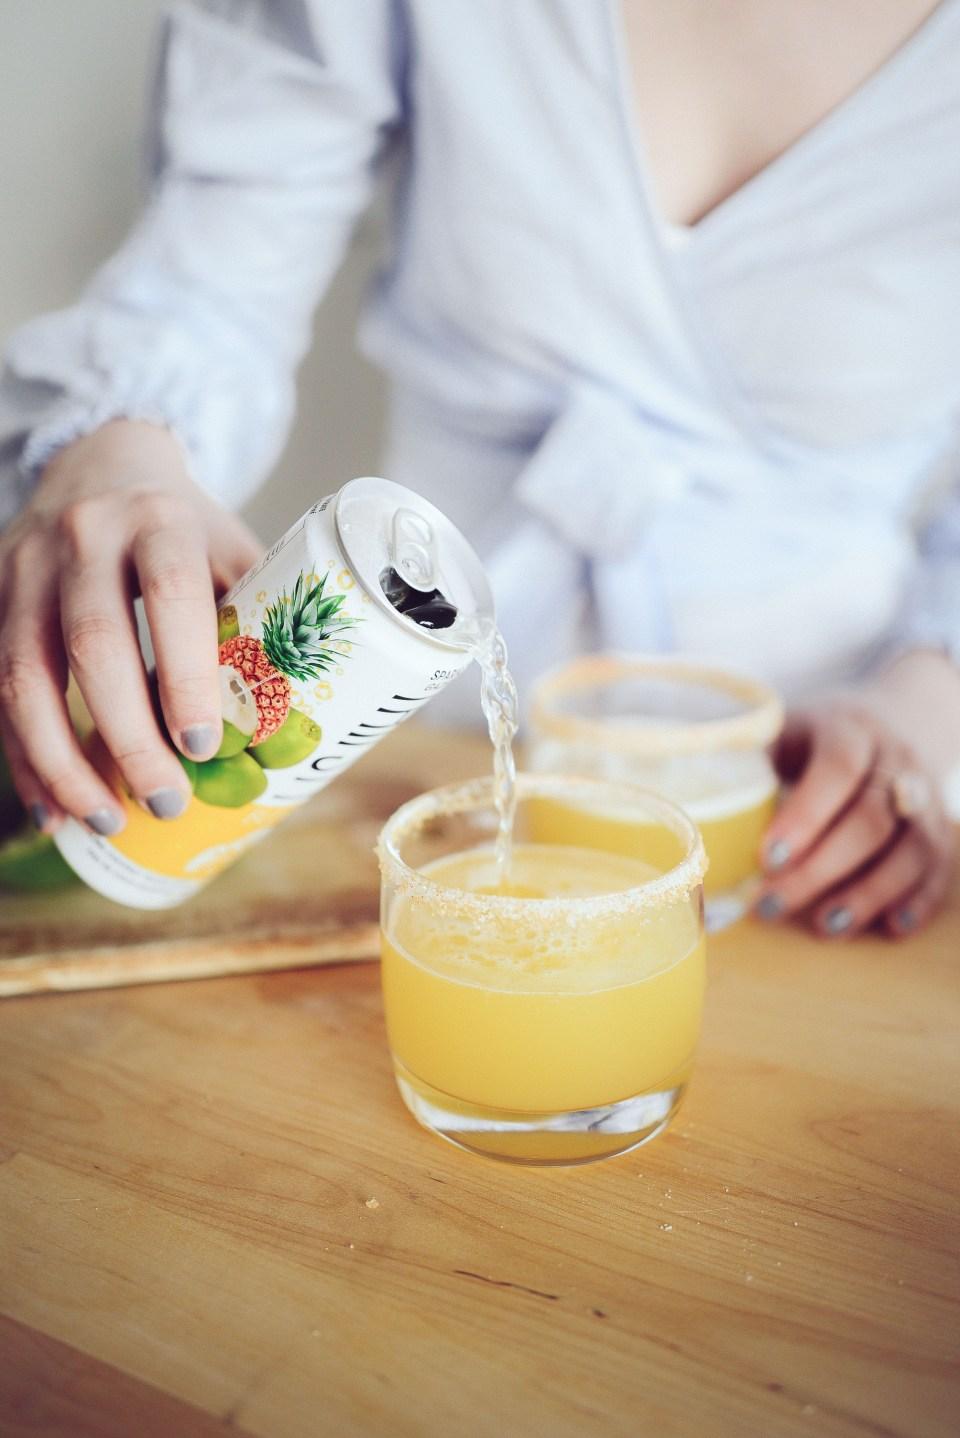 Coconut Water Cocktail - a Spice Margarita Recipe